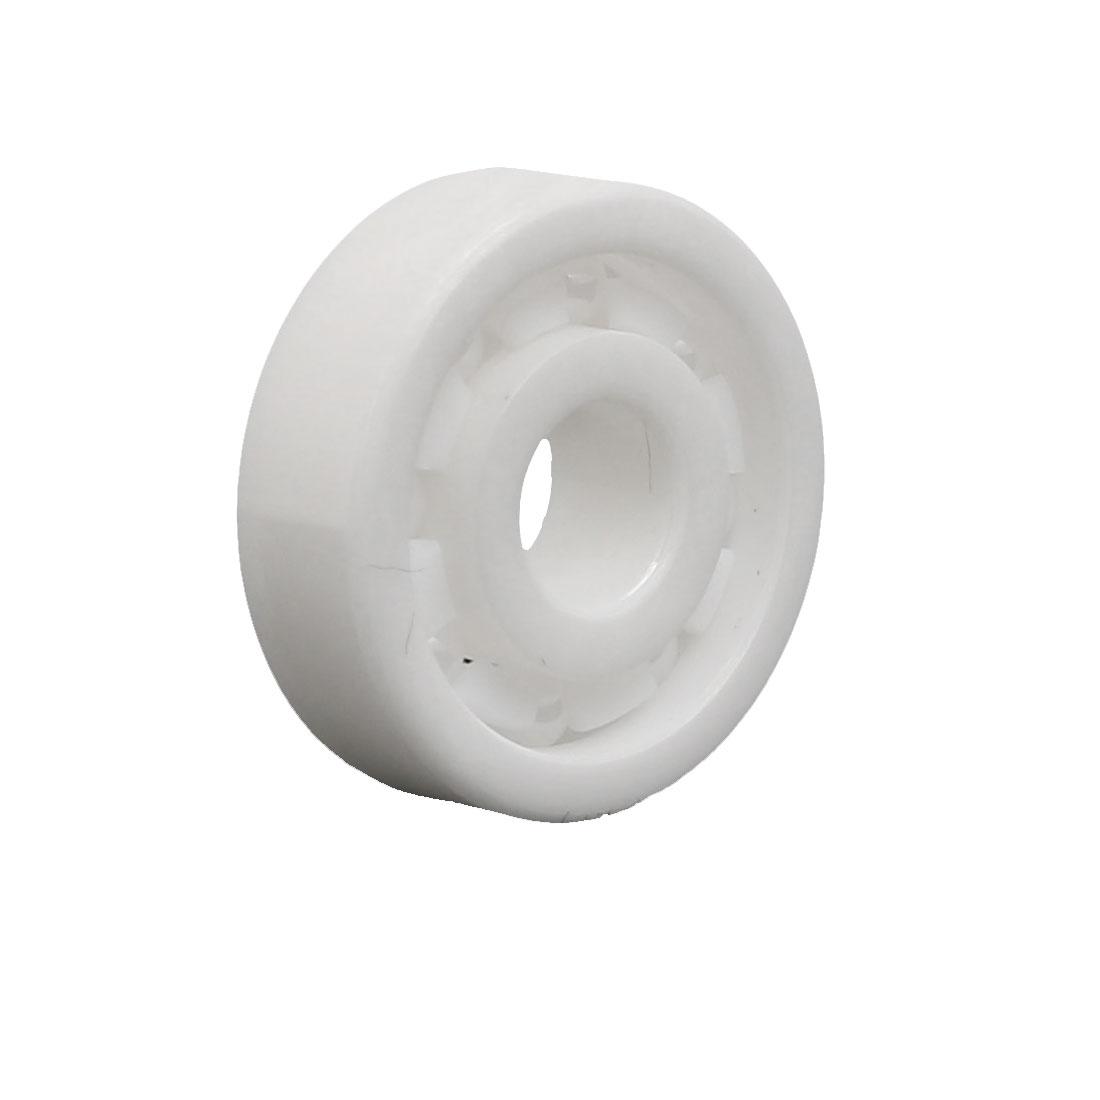 5mmx16mmx5mm Full Ceramic Zirconia Oxide Ball Bearing 625